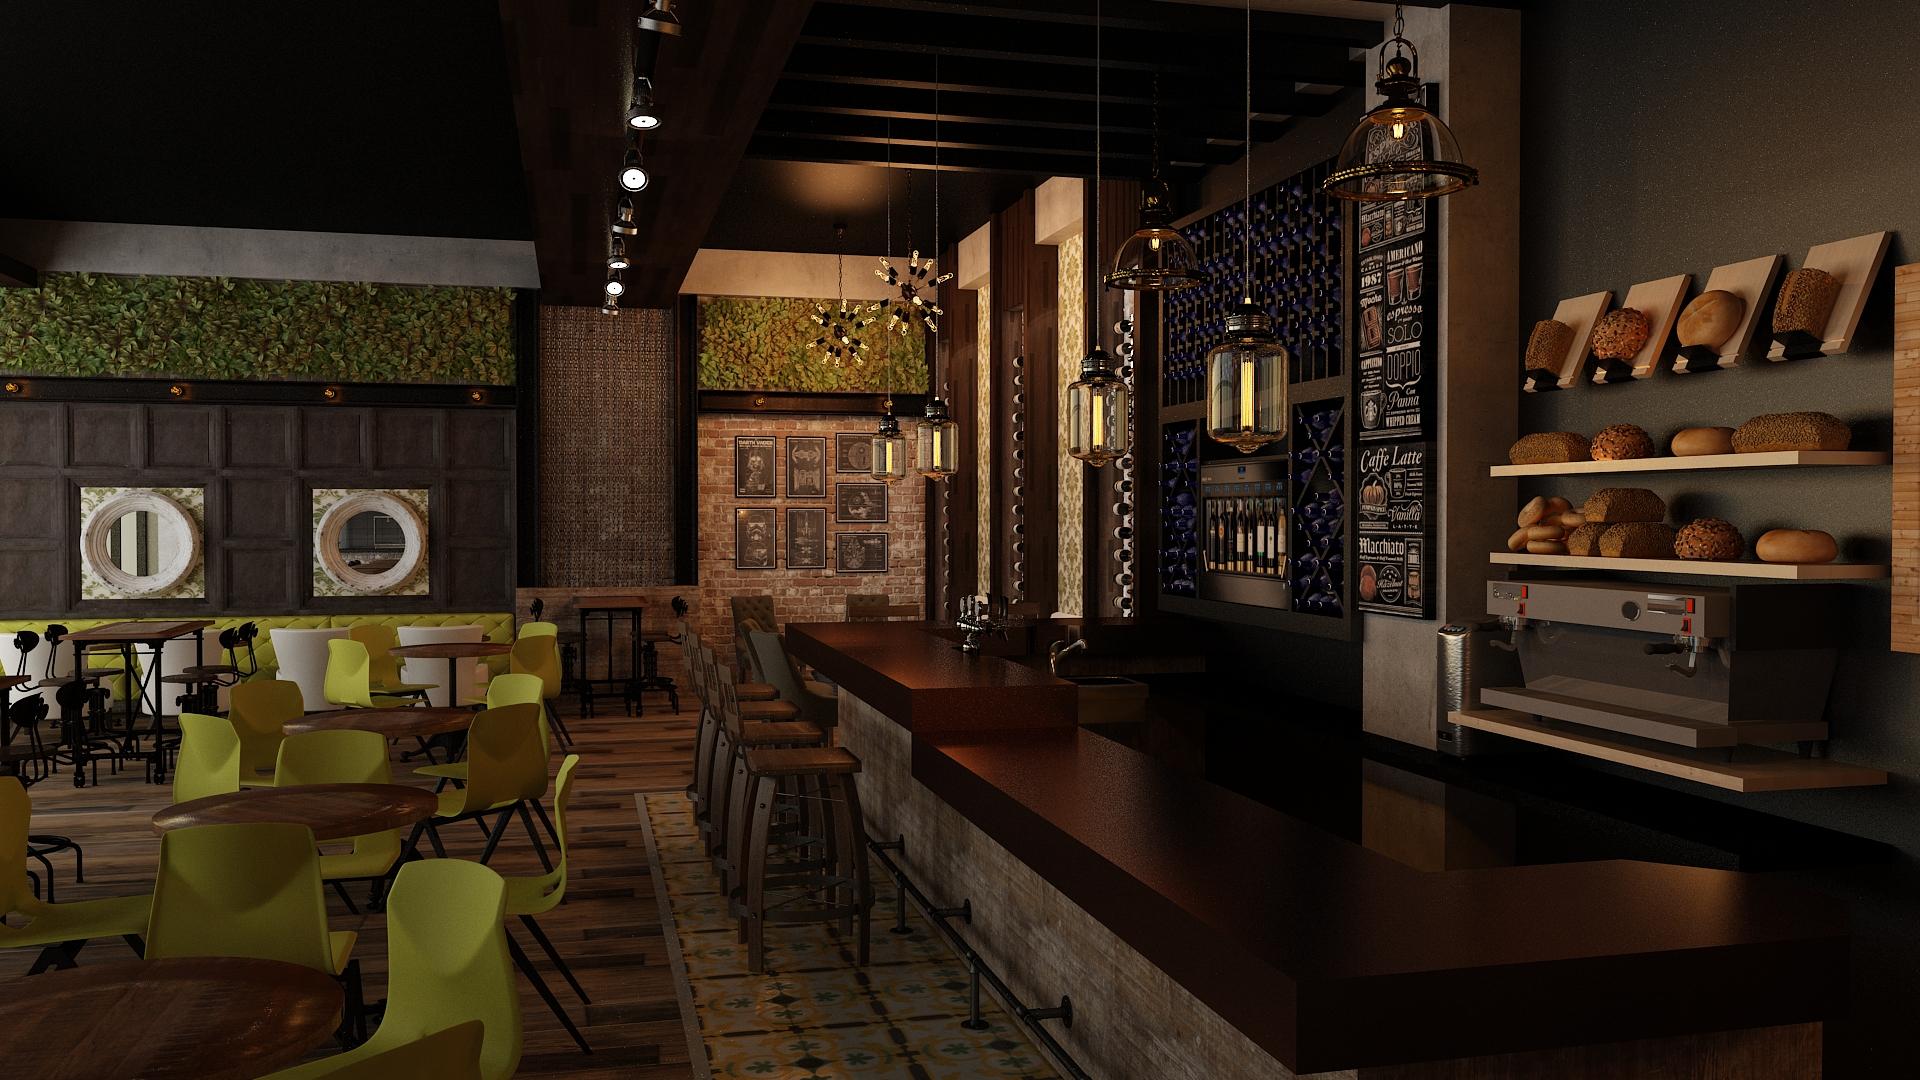 Cafe wine bar 03